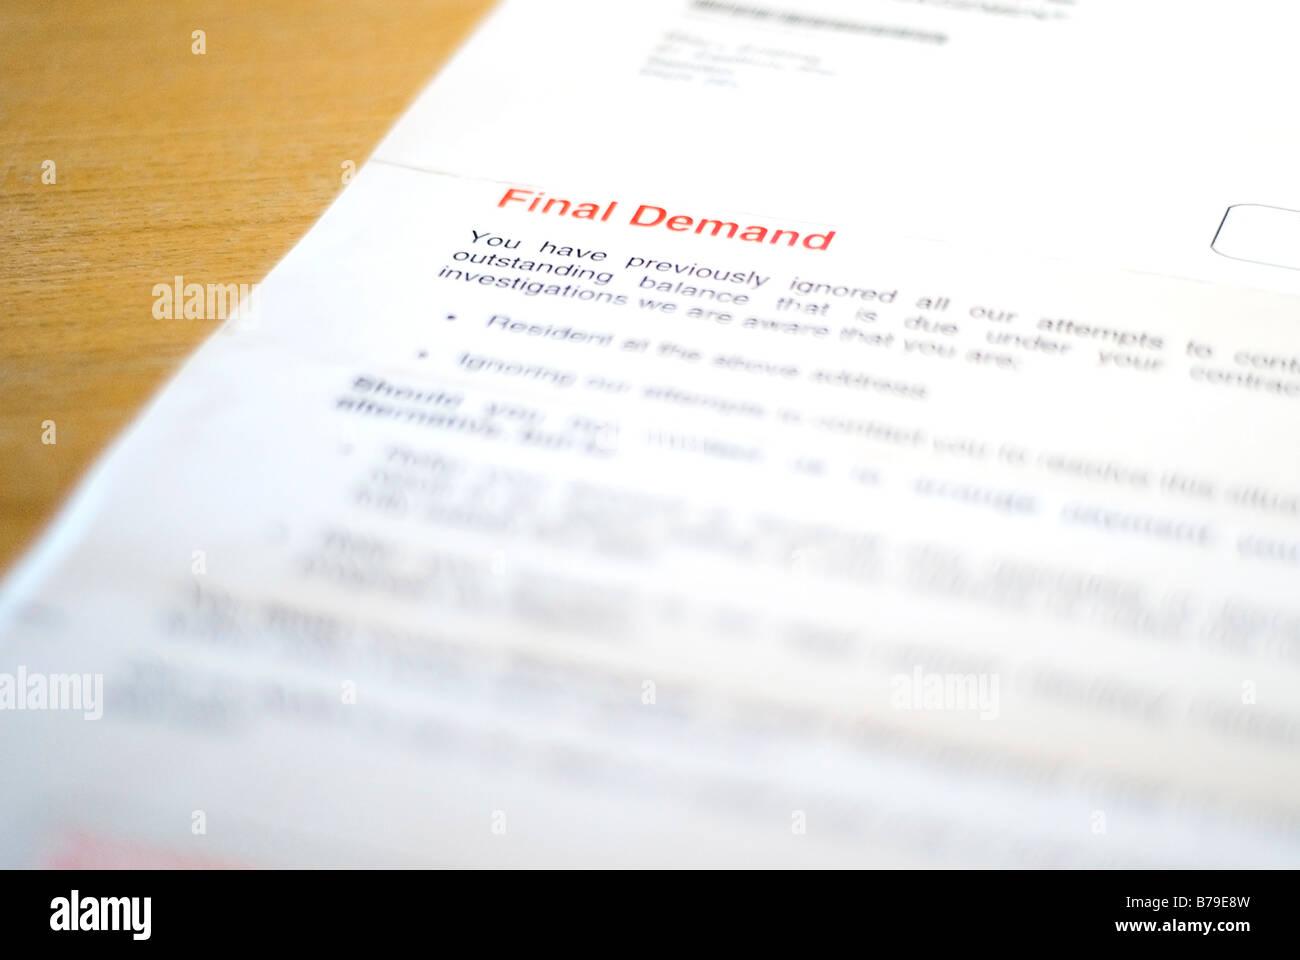 final demand letter - Stock Image